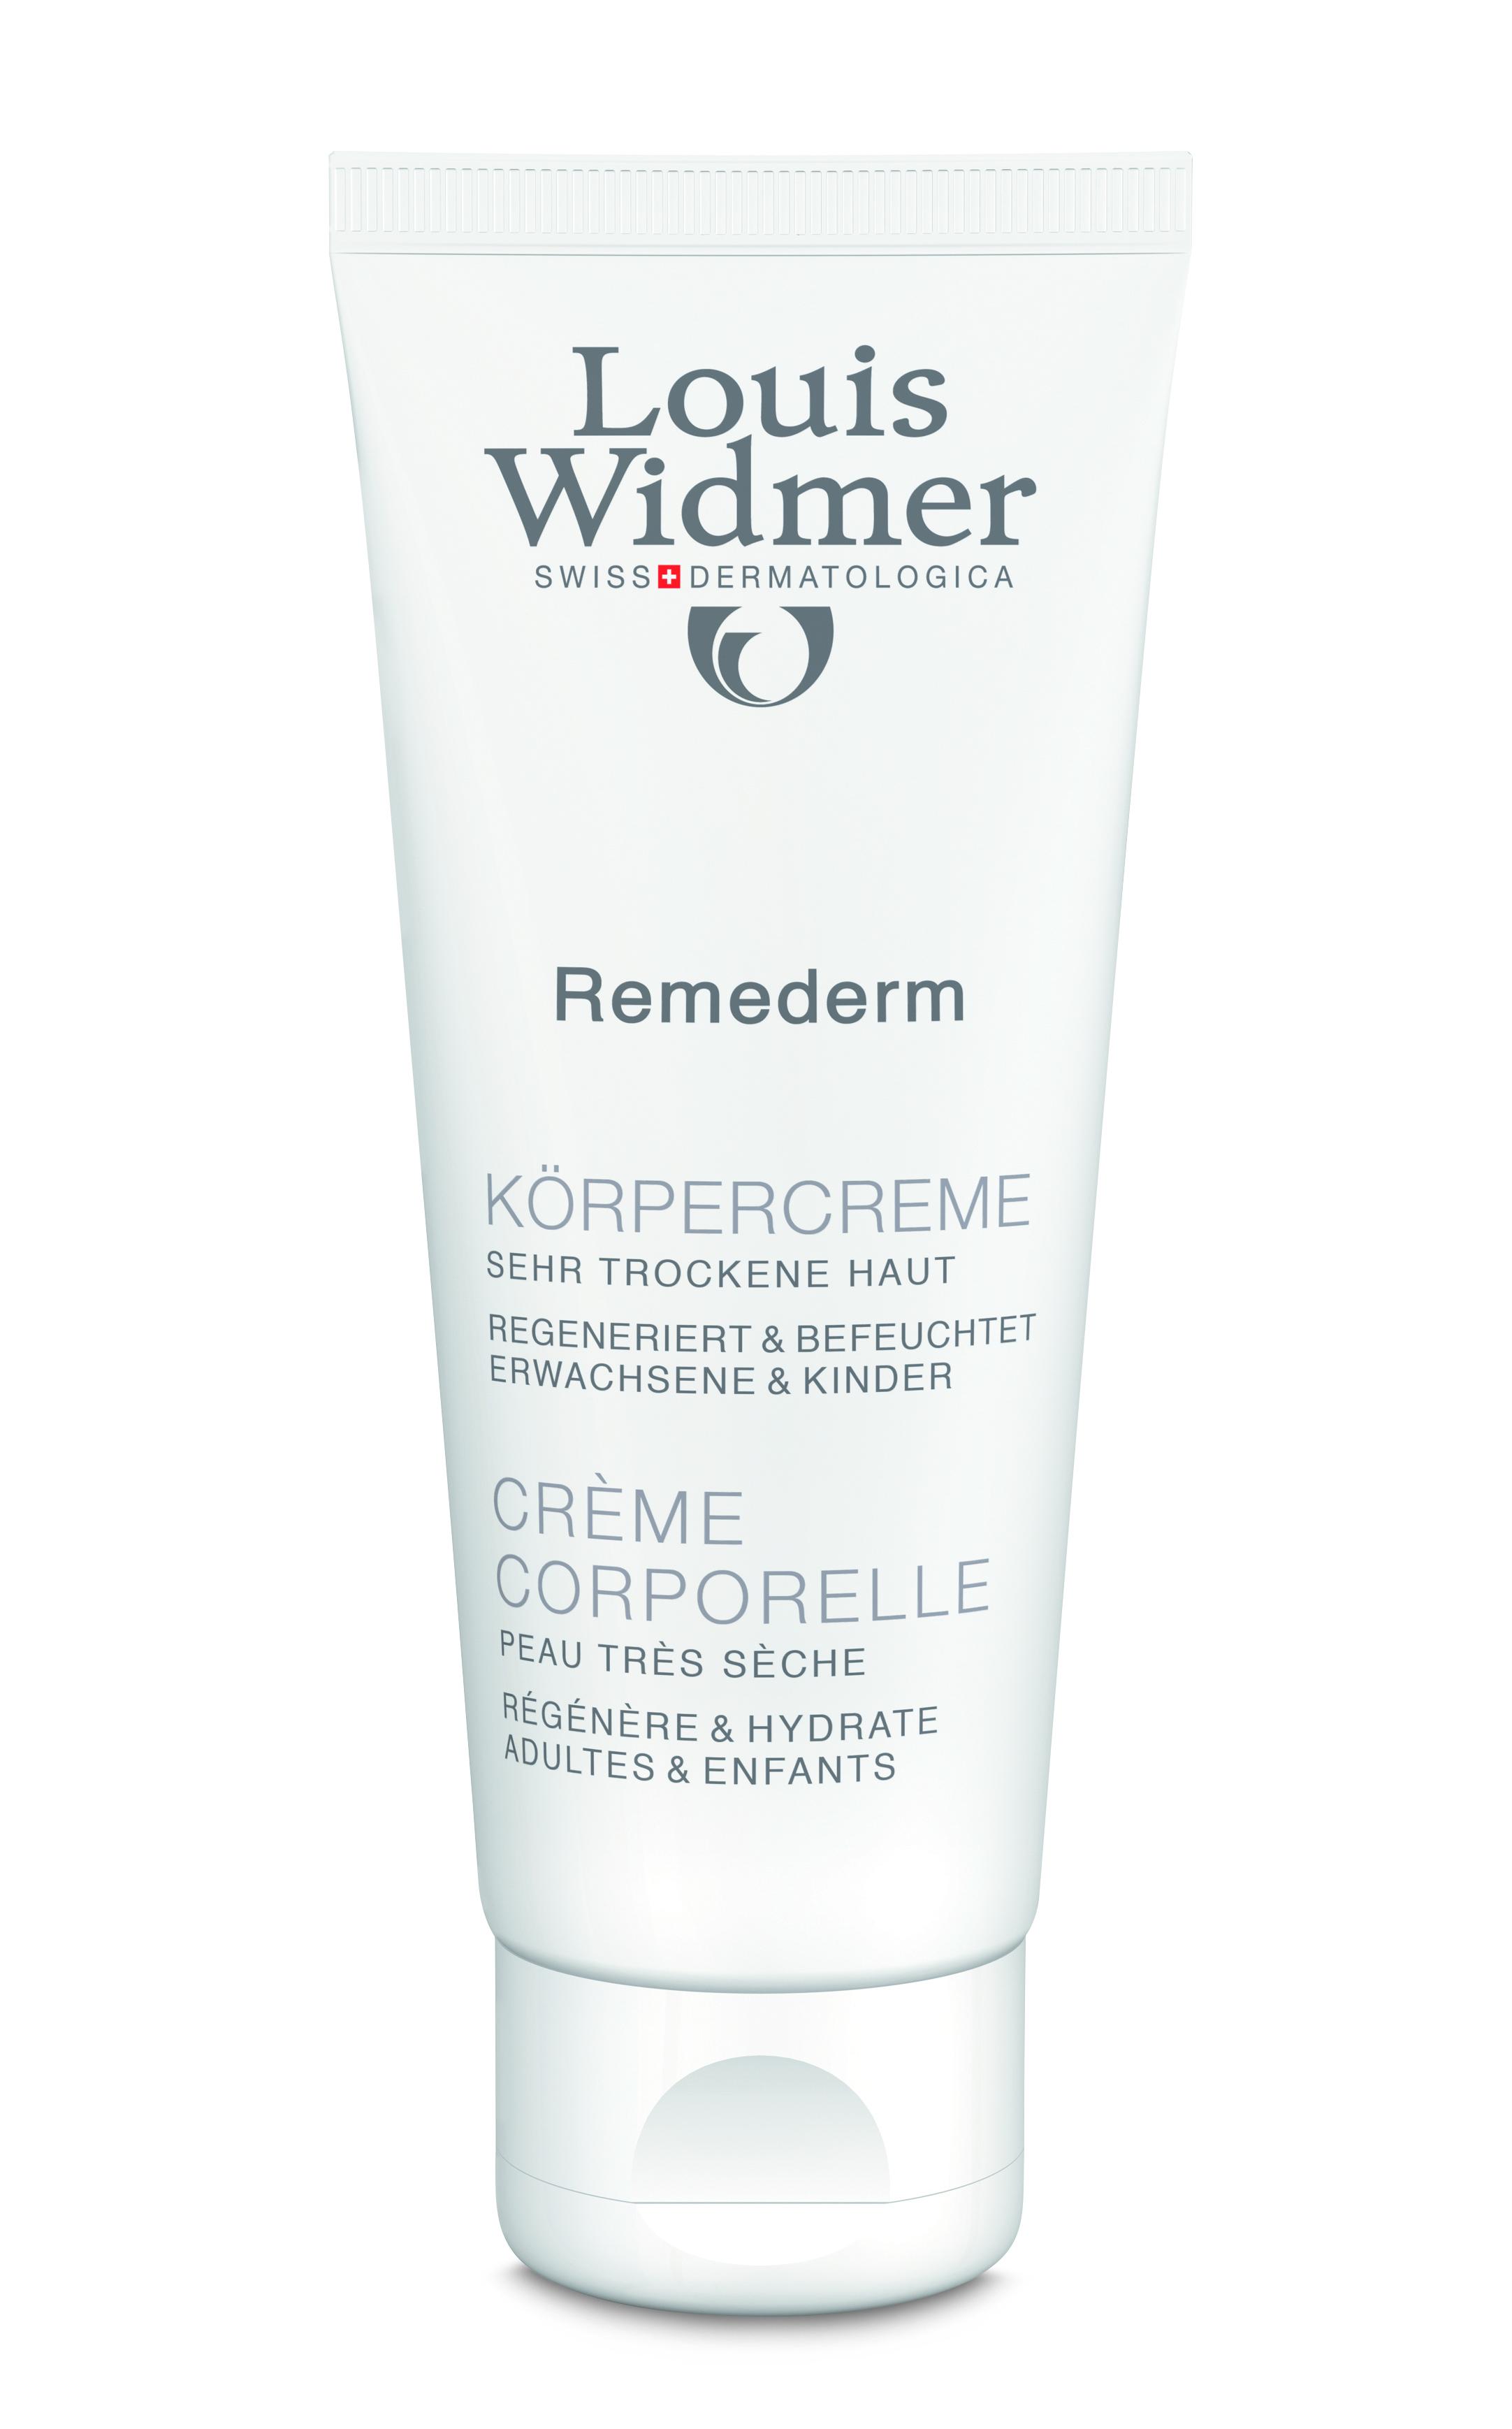 LOUIS WIDMER Remederm Körpercreme – 75 ml, ohne Parfüm